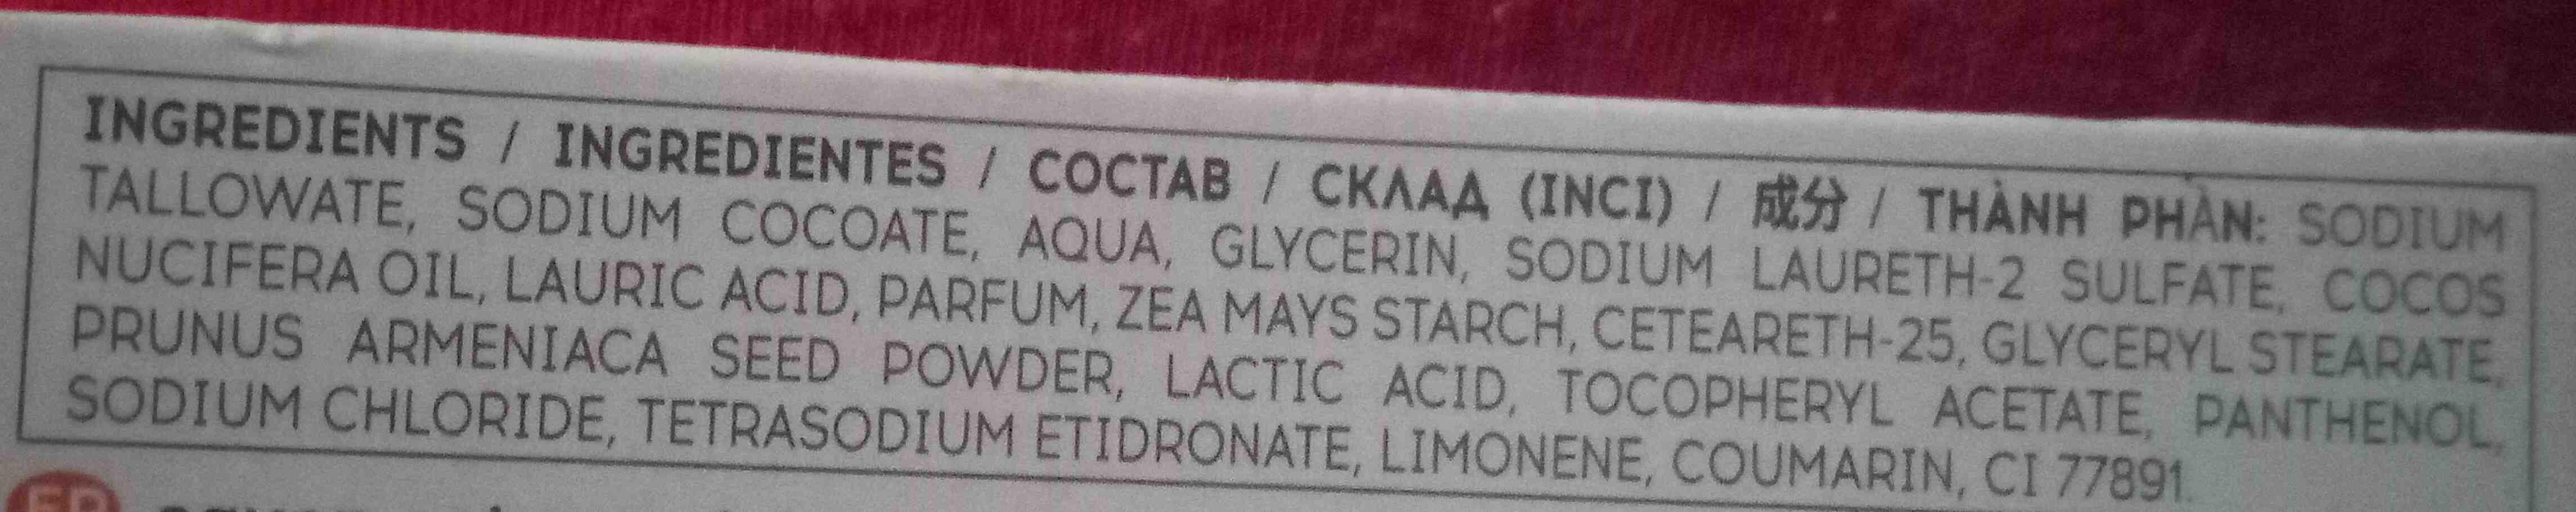 Exfoliante - Ingredients - en